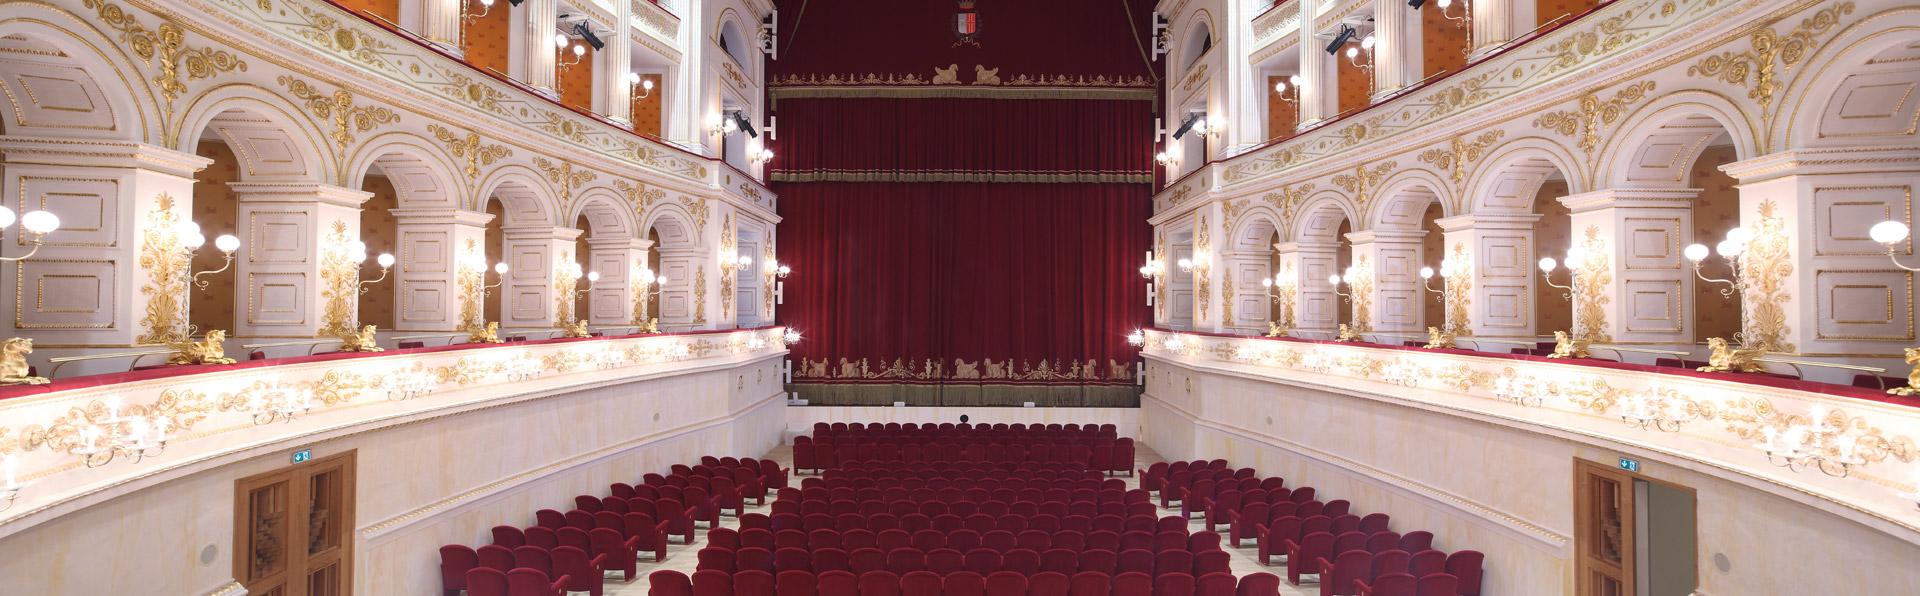 cmb-restauri-renovation-rimini-teatro-galli-theater-sala-copertina